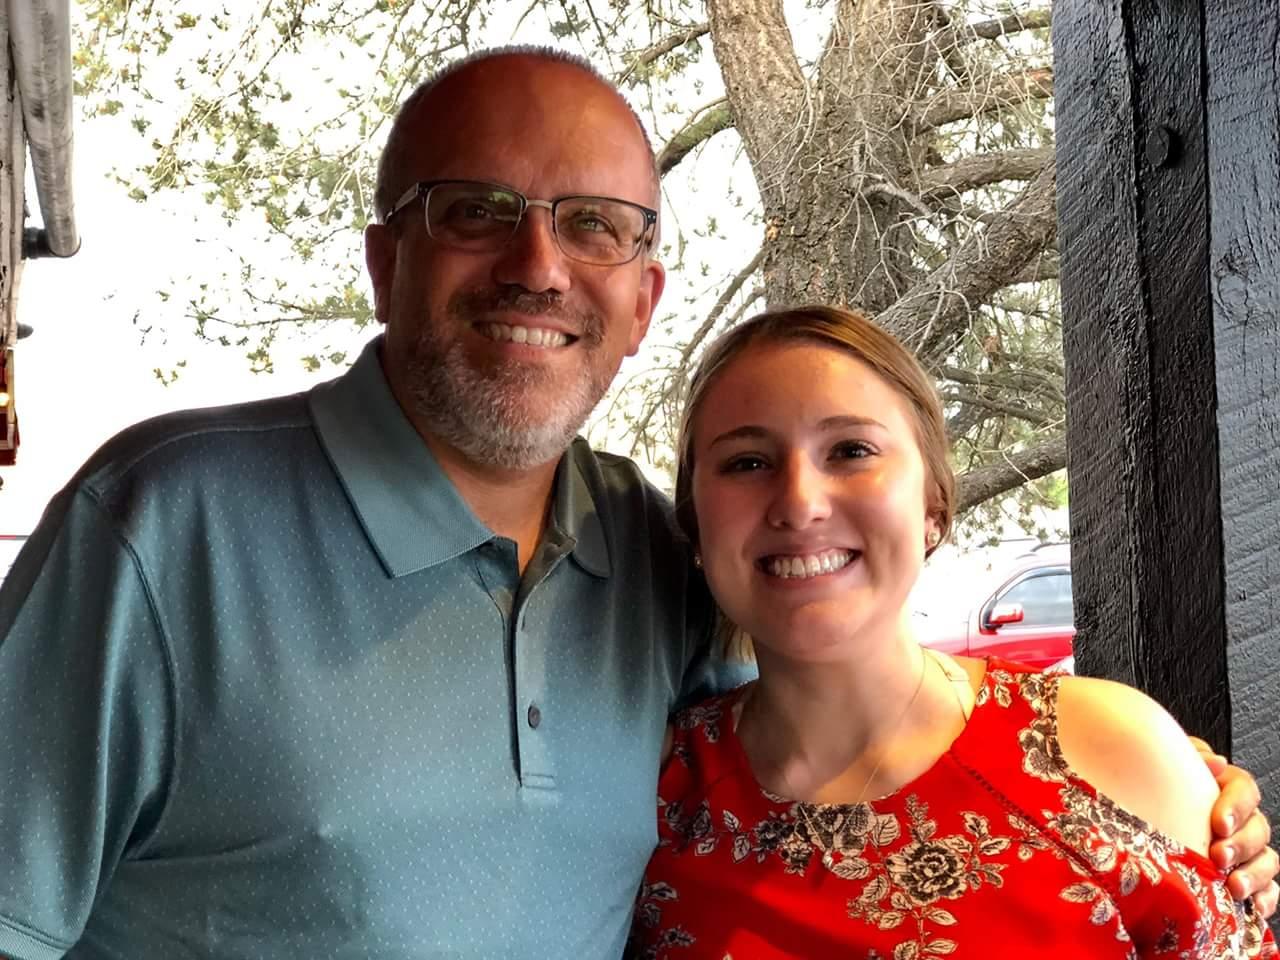 Professor Michael Gizzi and Amy Juzwin